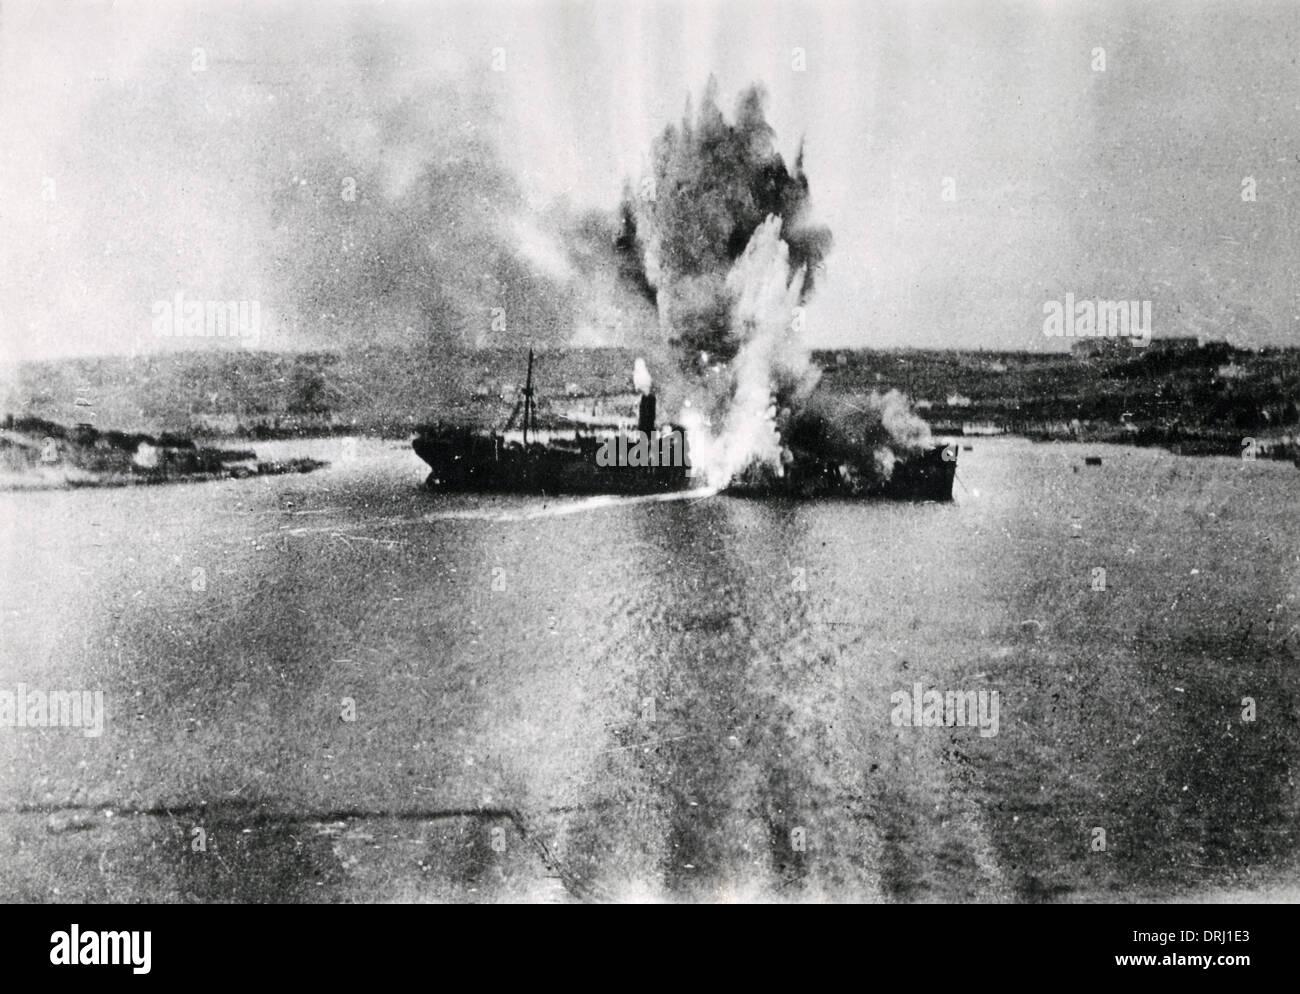 Ship struck by torpedo, Salonika, WW1 - Stock Image